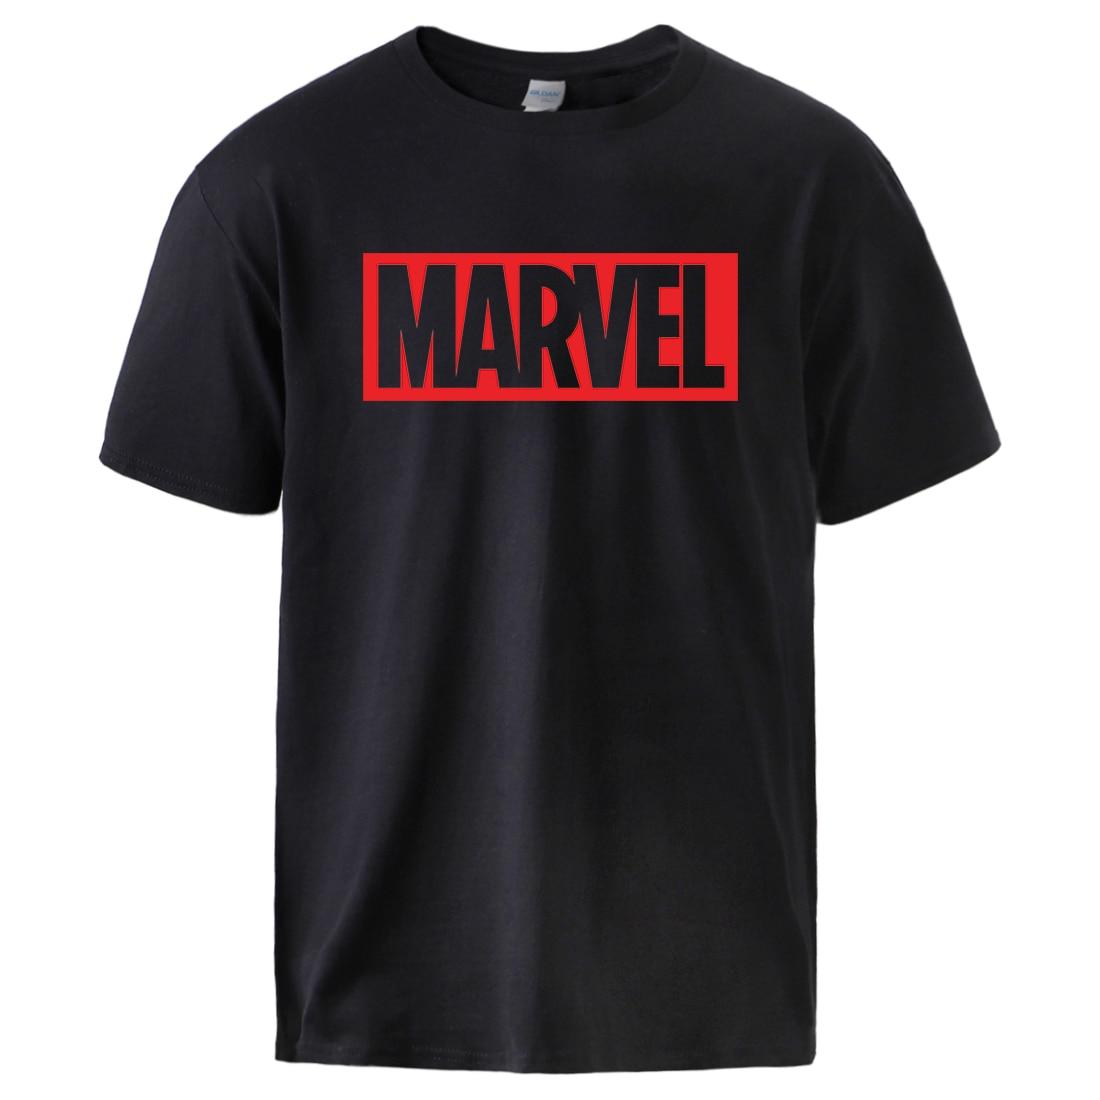 The Avengers Marvel Tshirts Man High Quality Cotton Tee Summer Casual T Shirt 2020 Man Brand Loose Fit Sporswear Fashion T Shirt